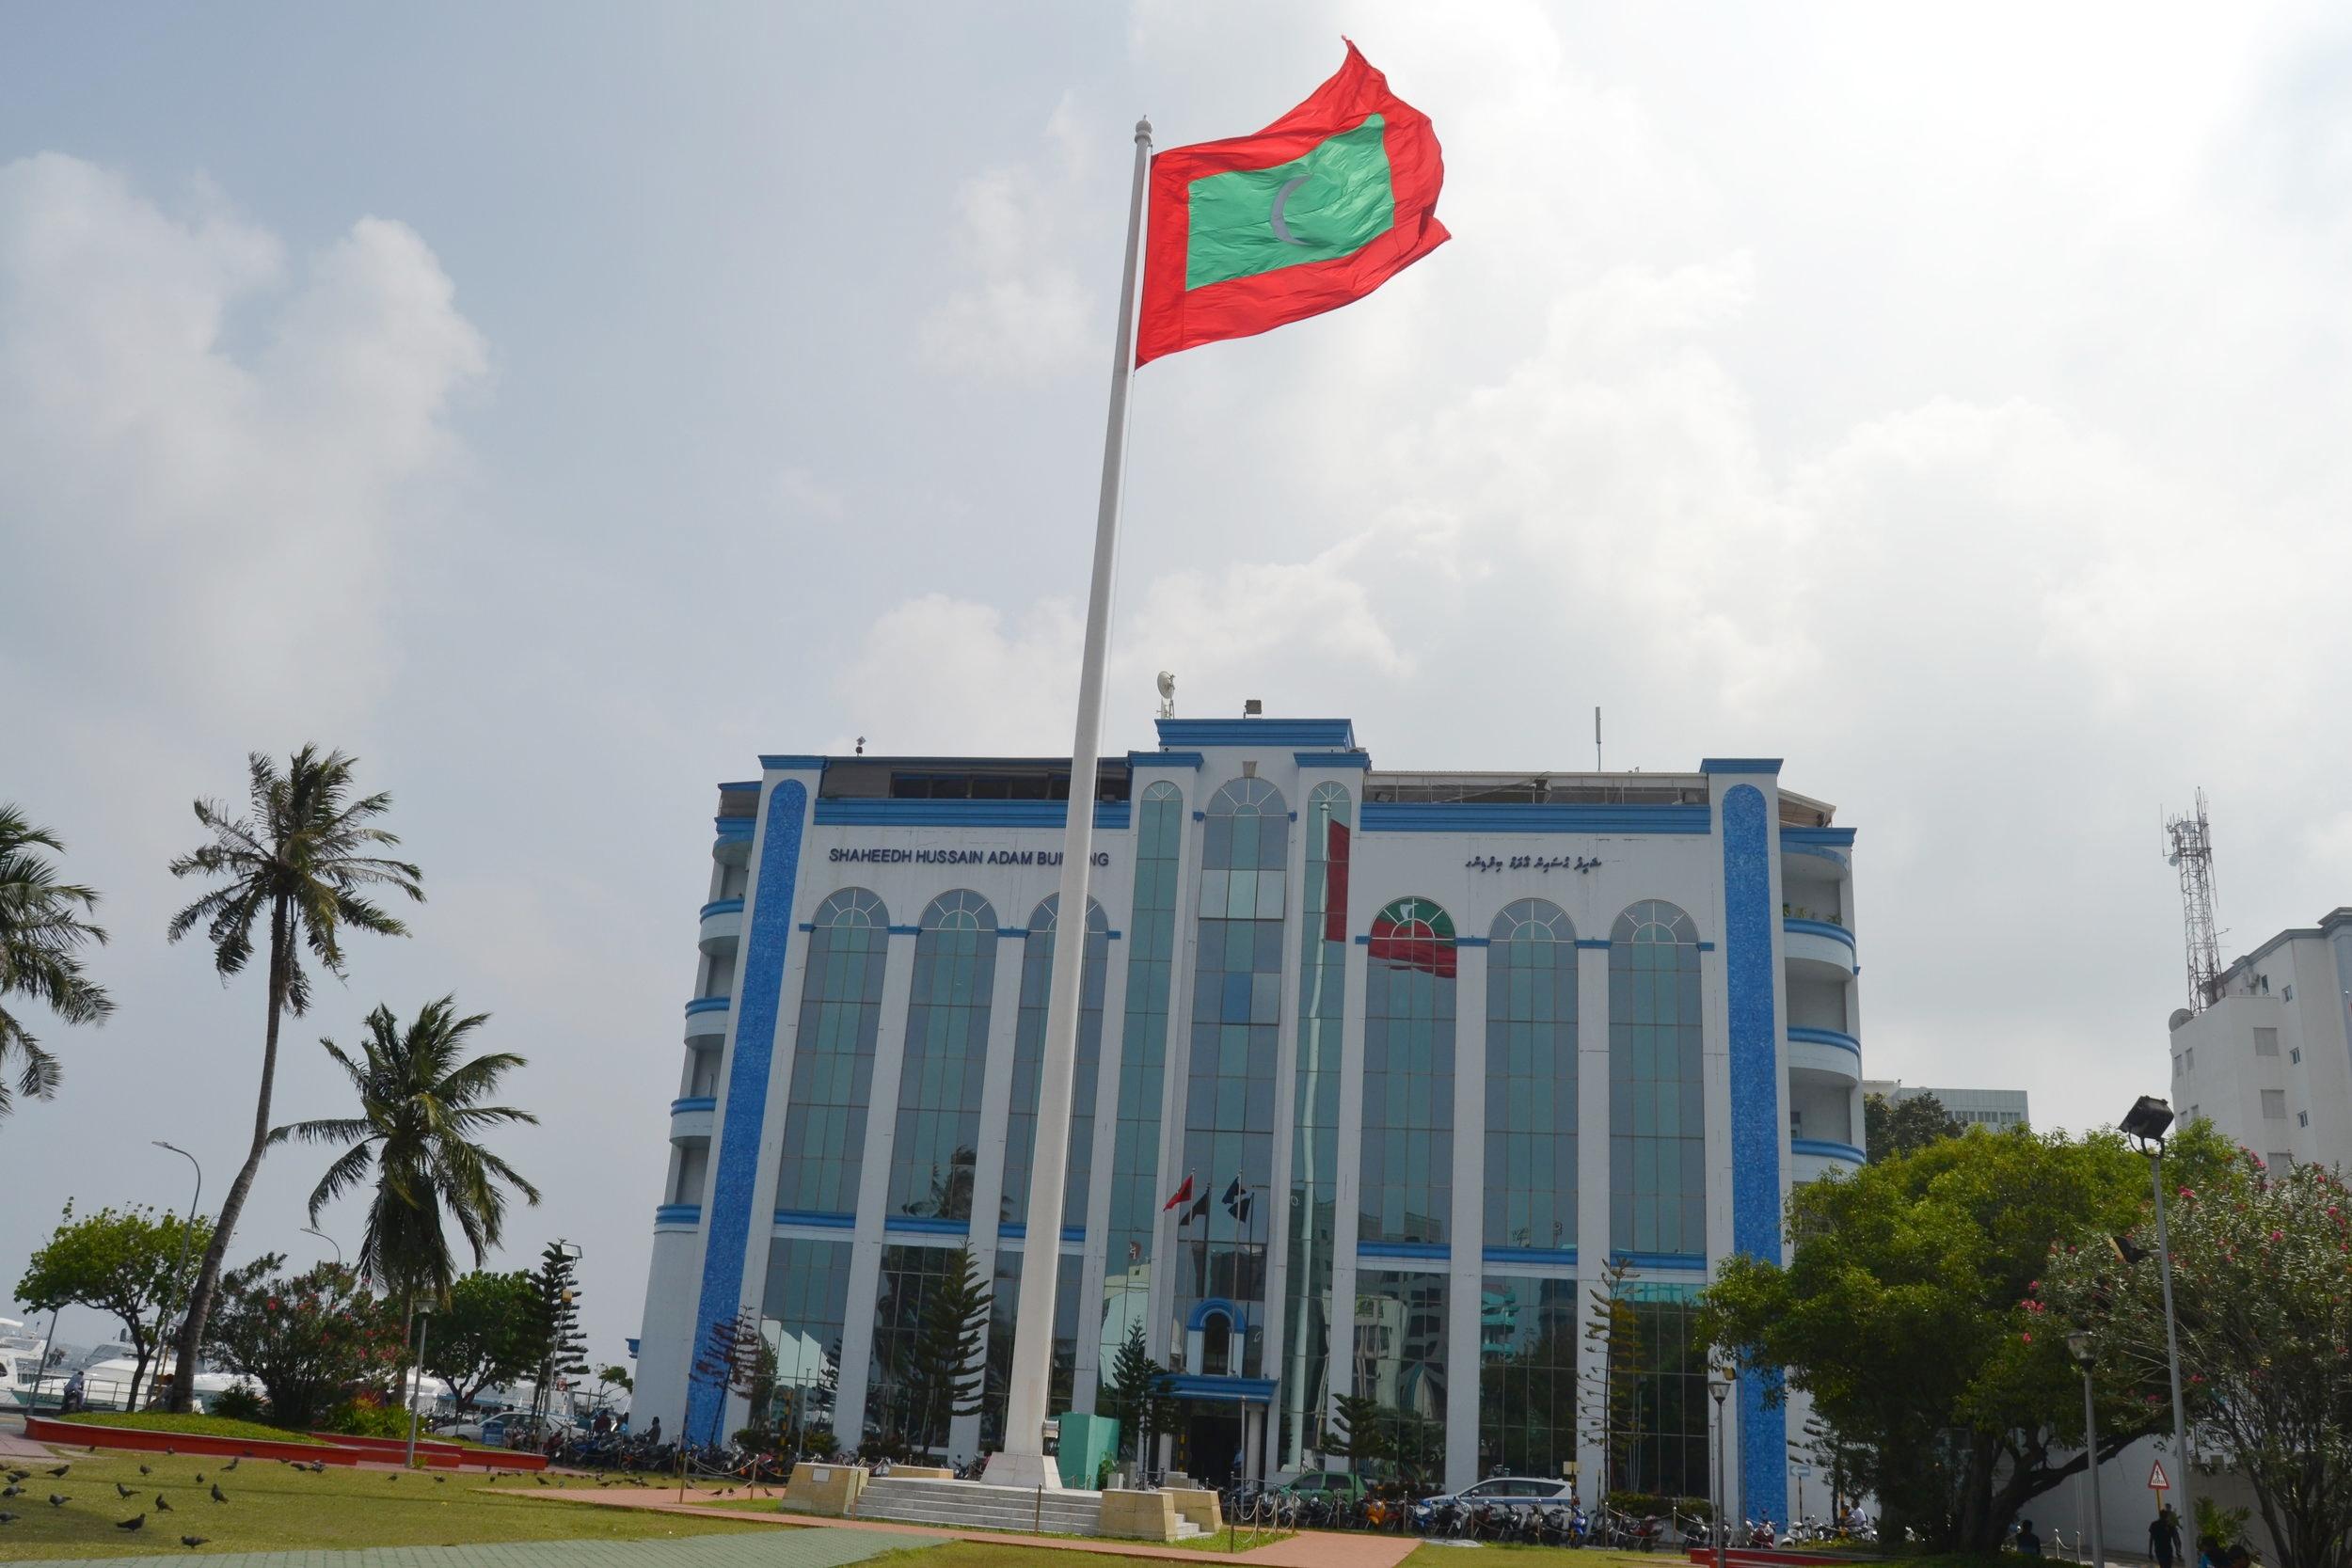 The Malé Police Headquarters